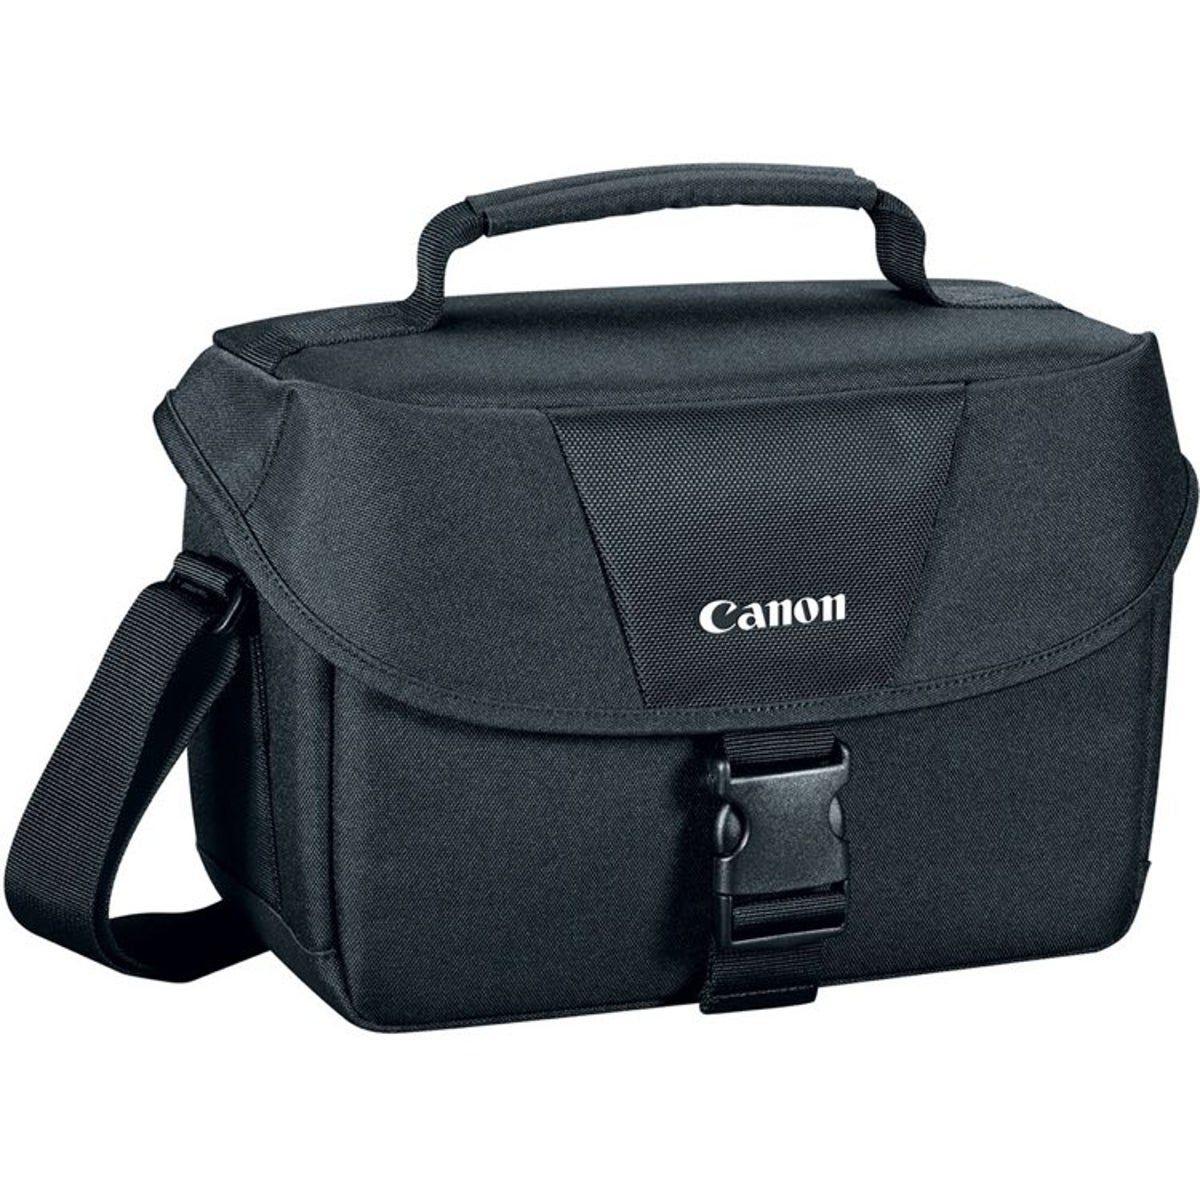 Canon Camera Shoulder Bag NWT in 2020 Camera shoulder